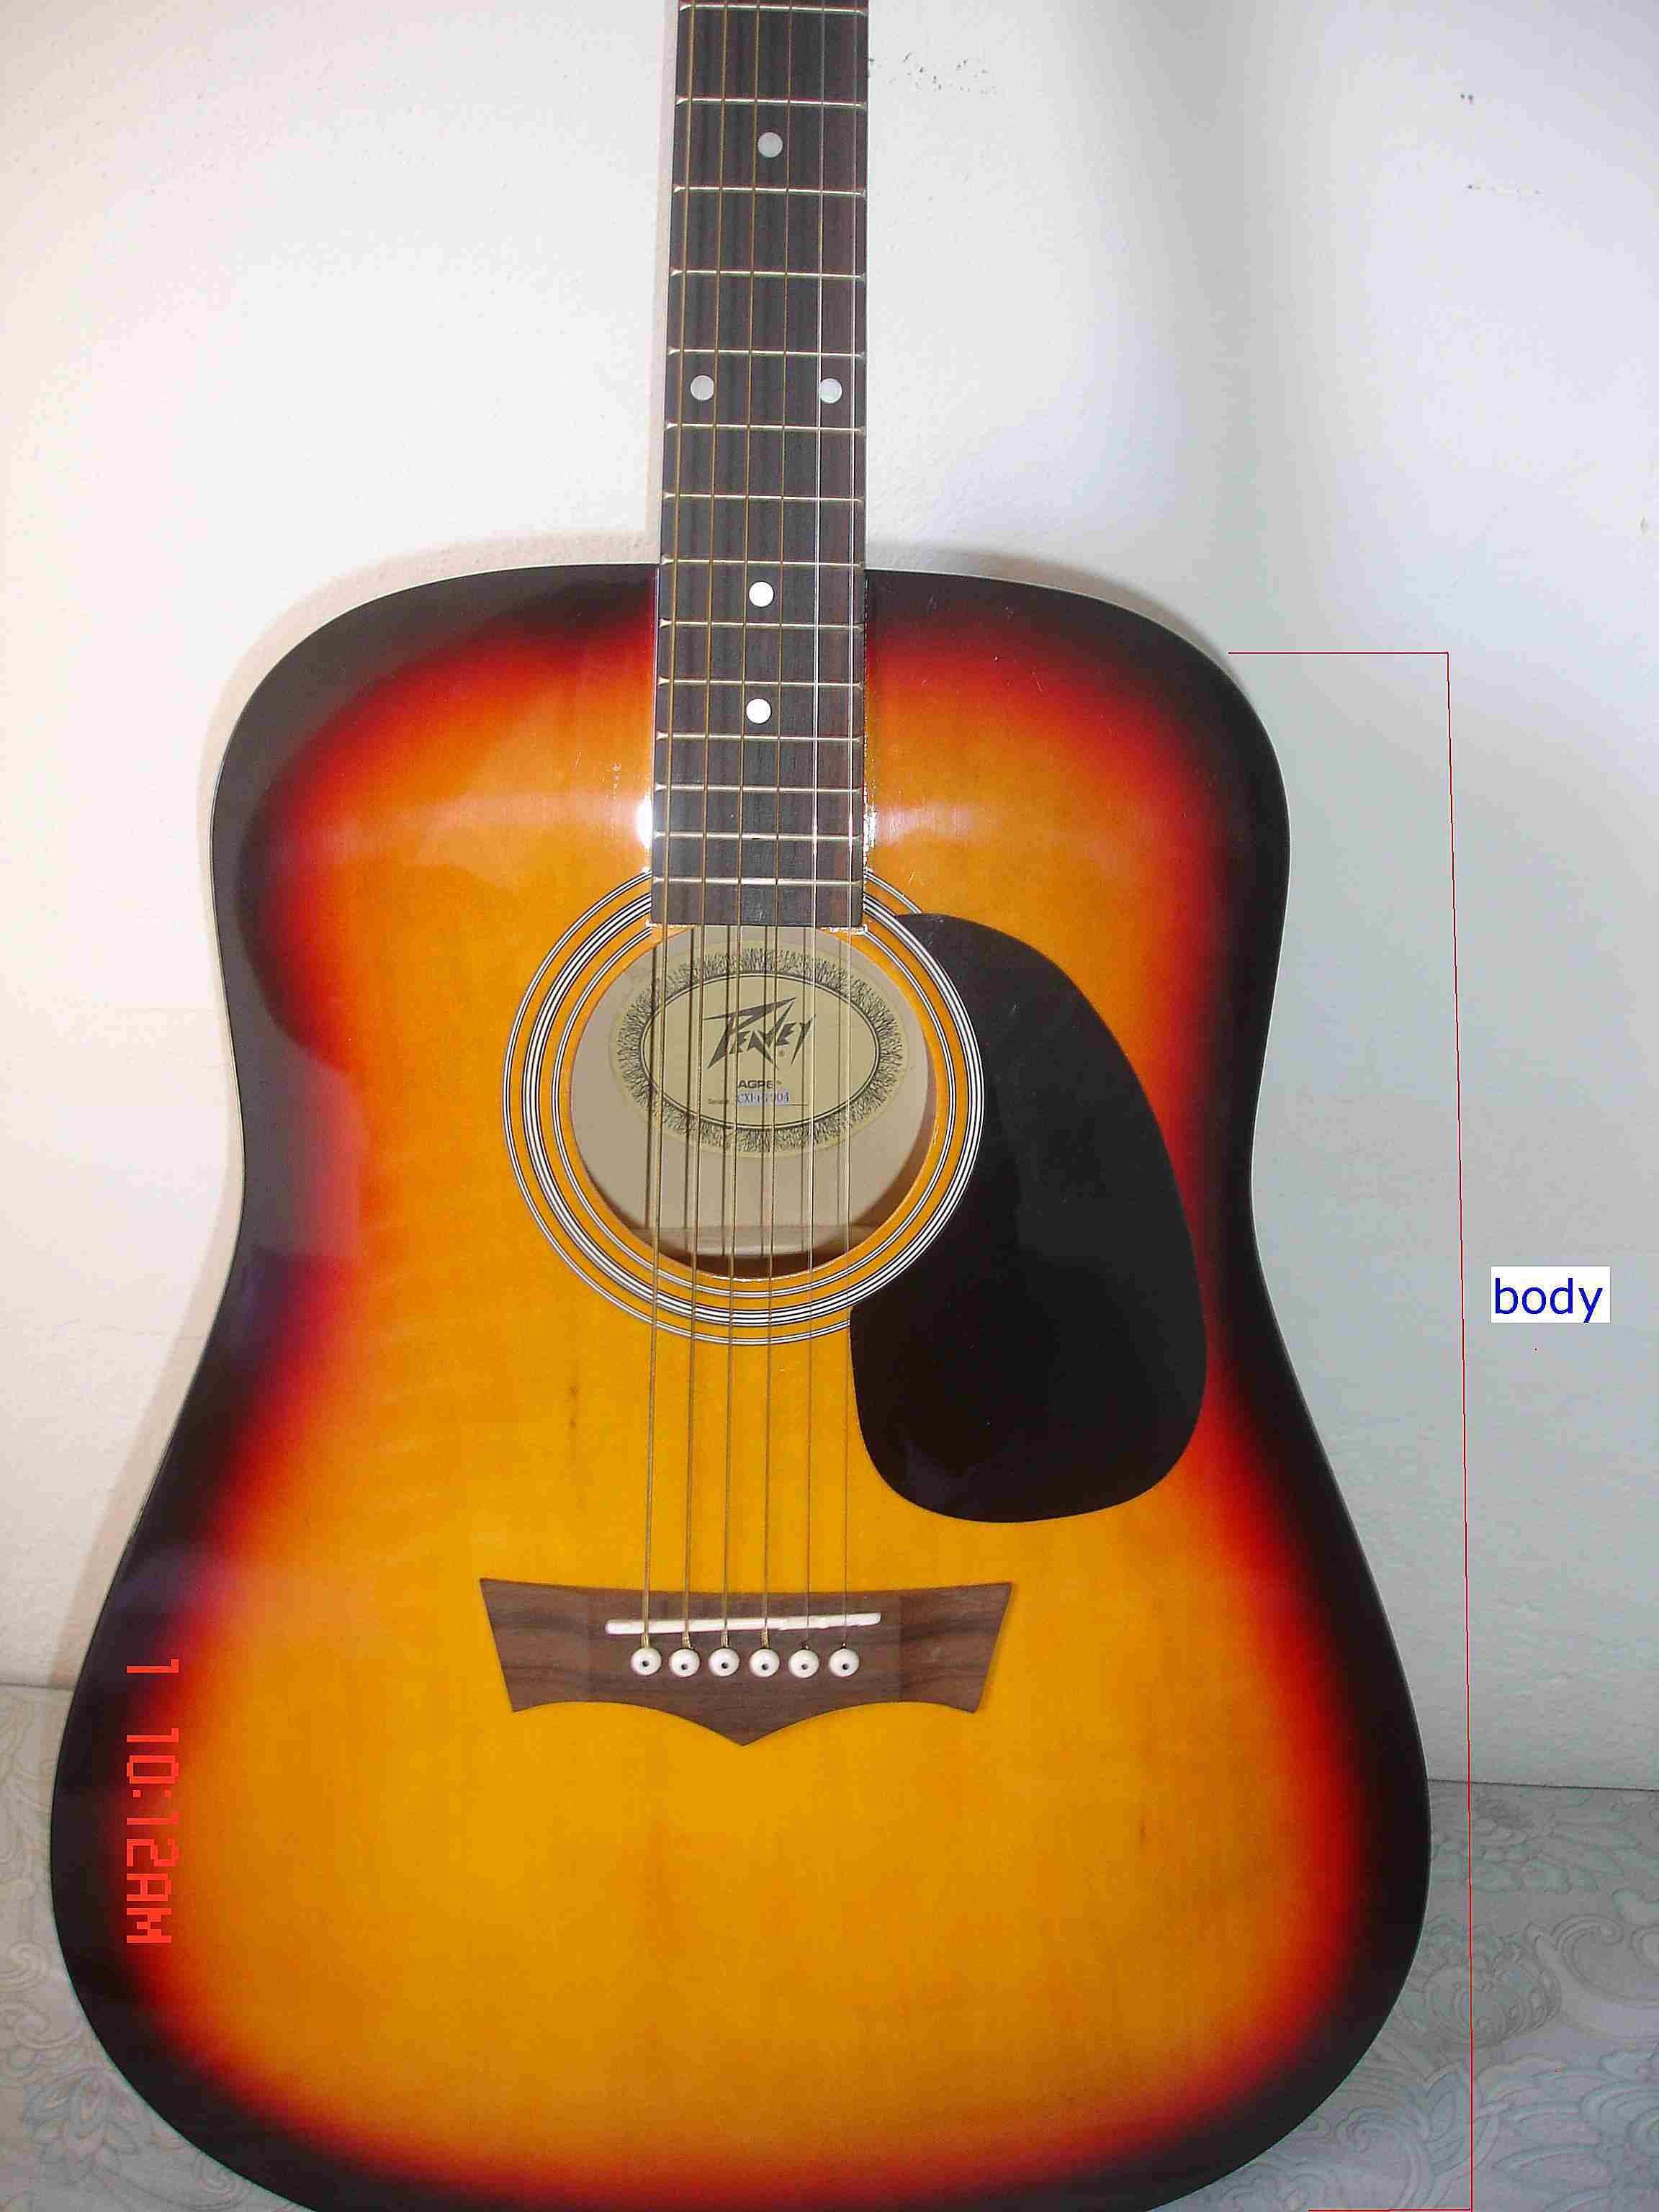 guitarparts5 58b8e3705f9b58af5c90e7dc JPG